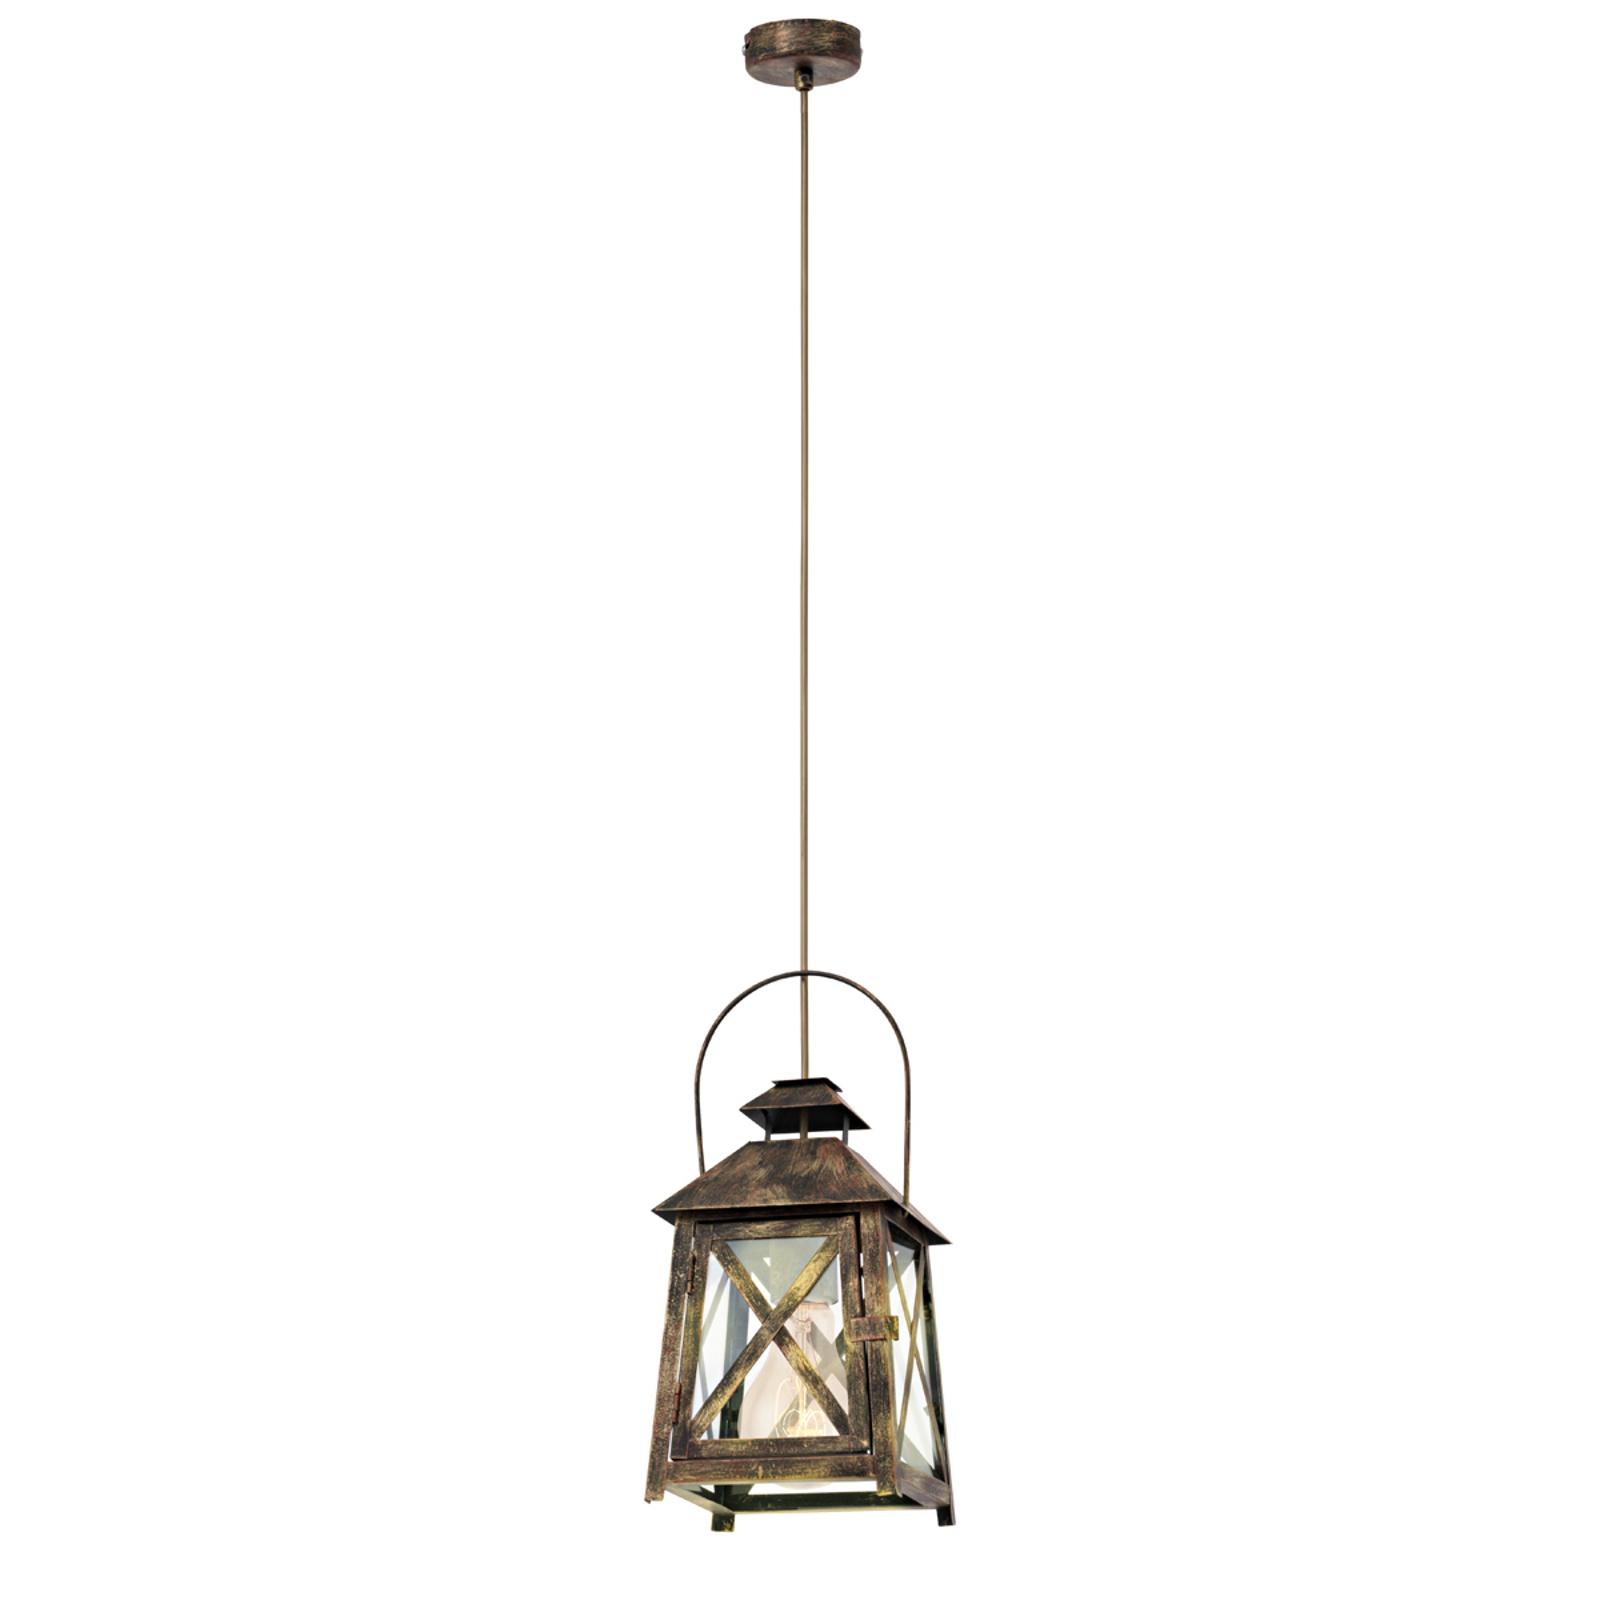 Valena Lantern-shaped Pendant Lamp_3031598_1